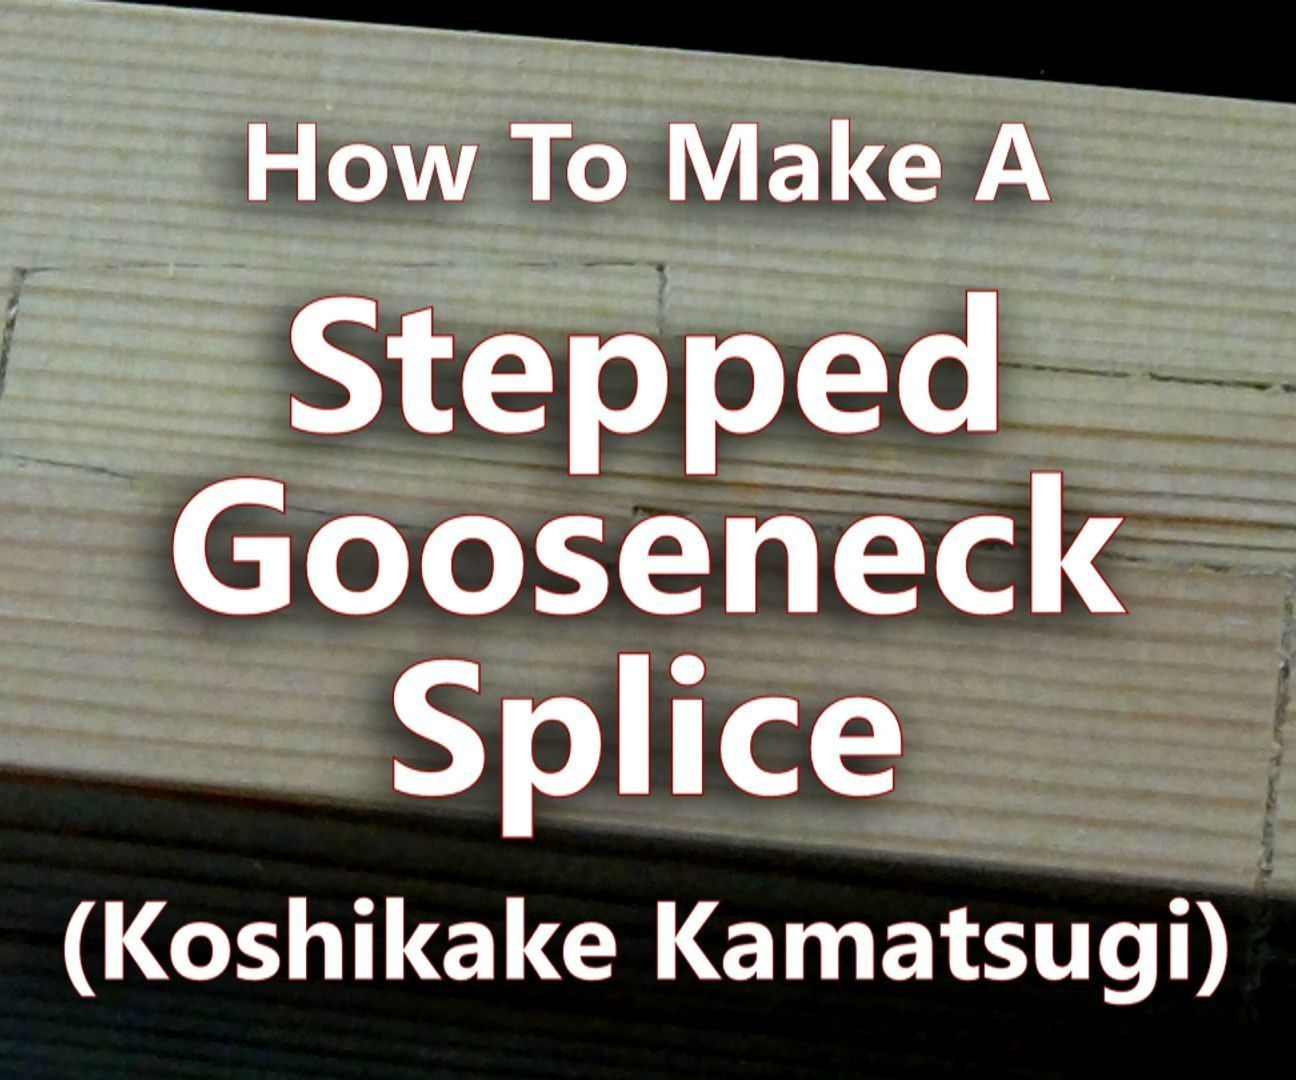 Stepped Gooseneck Splice (Koshikake kamatsugi)